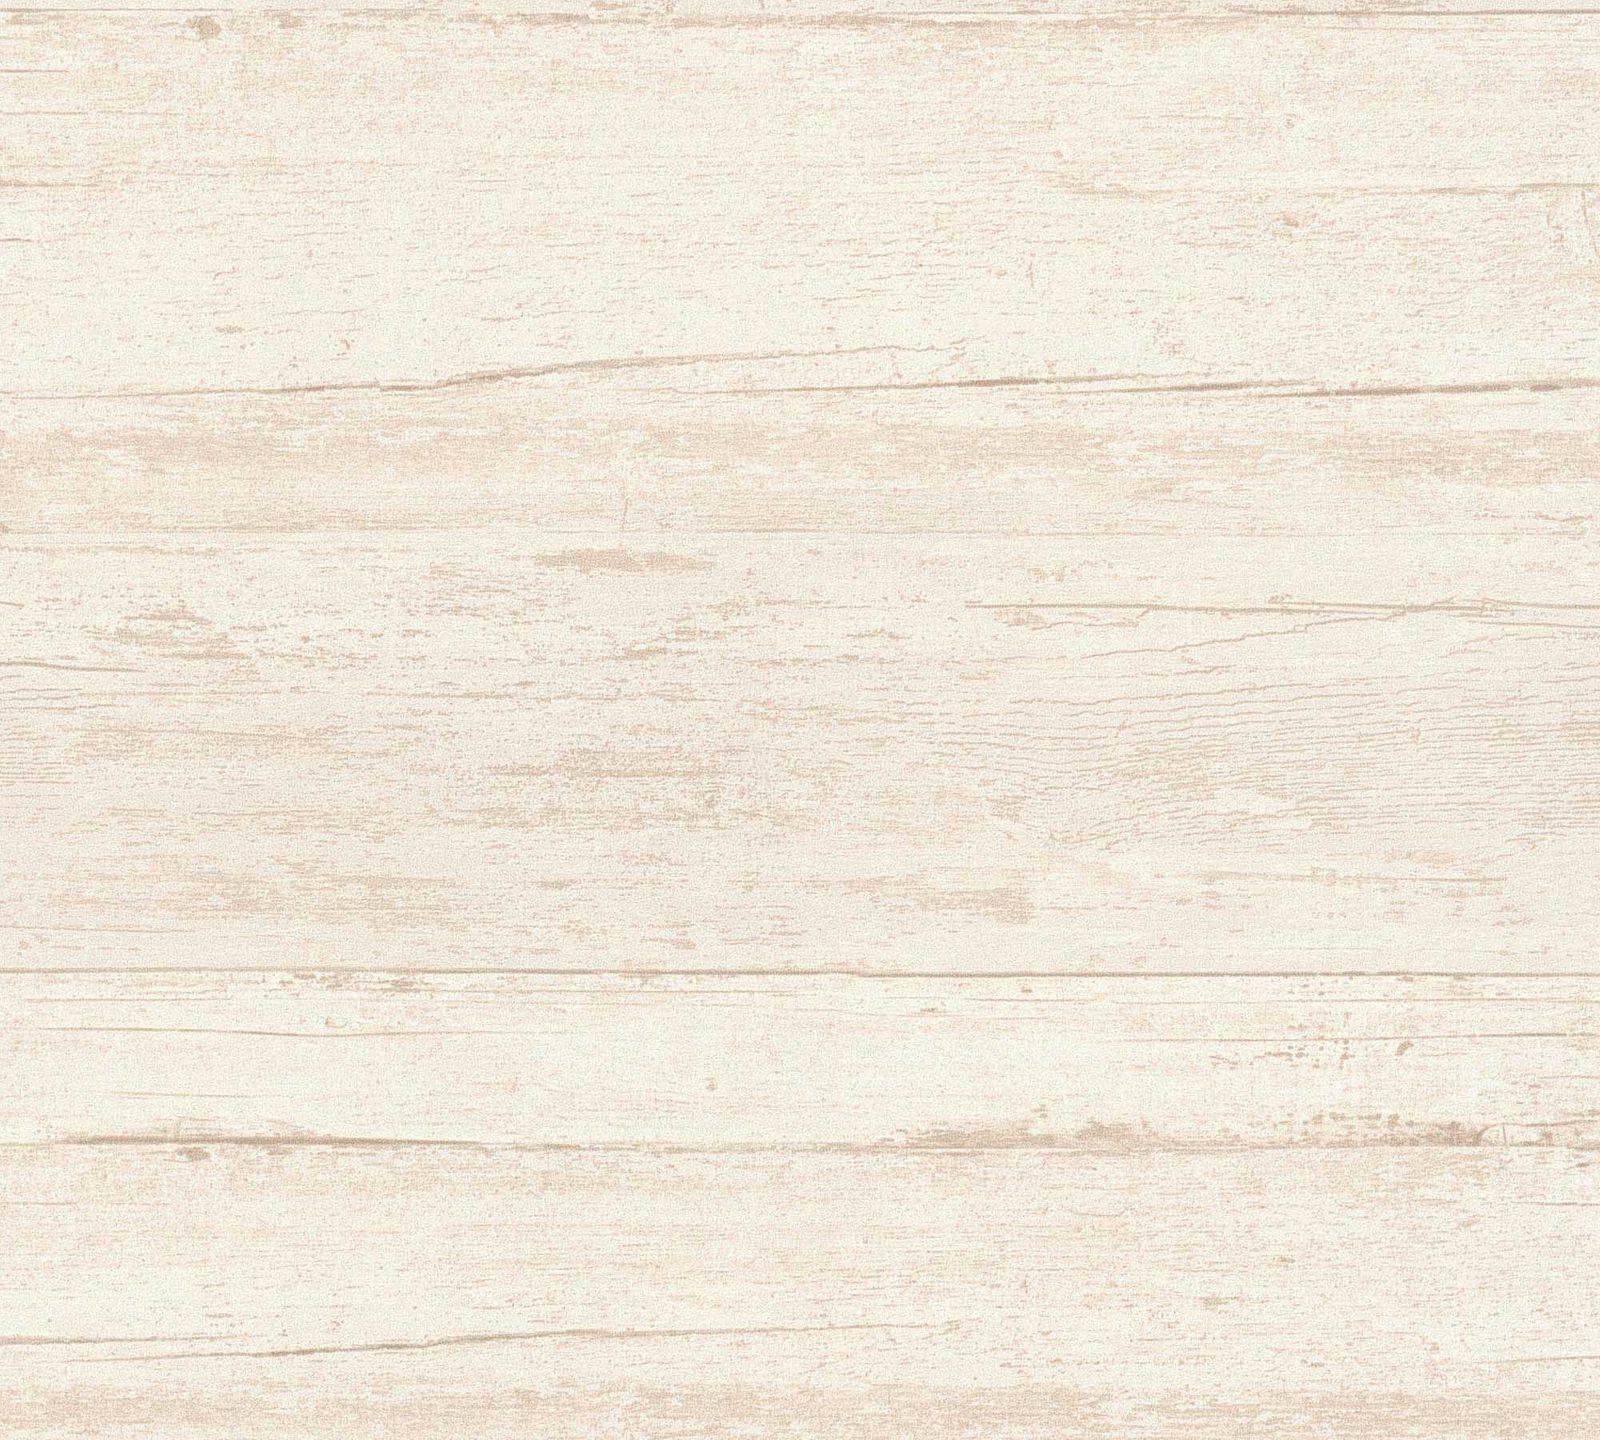 Vliestapete Holz-Optik Cremebraun Livingwalls 36394-4